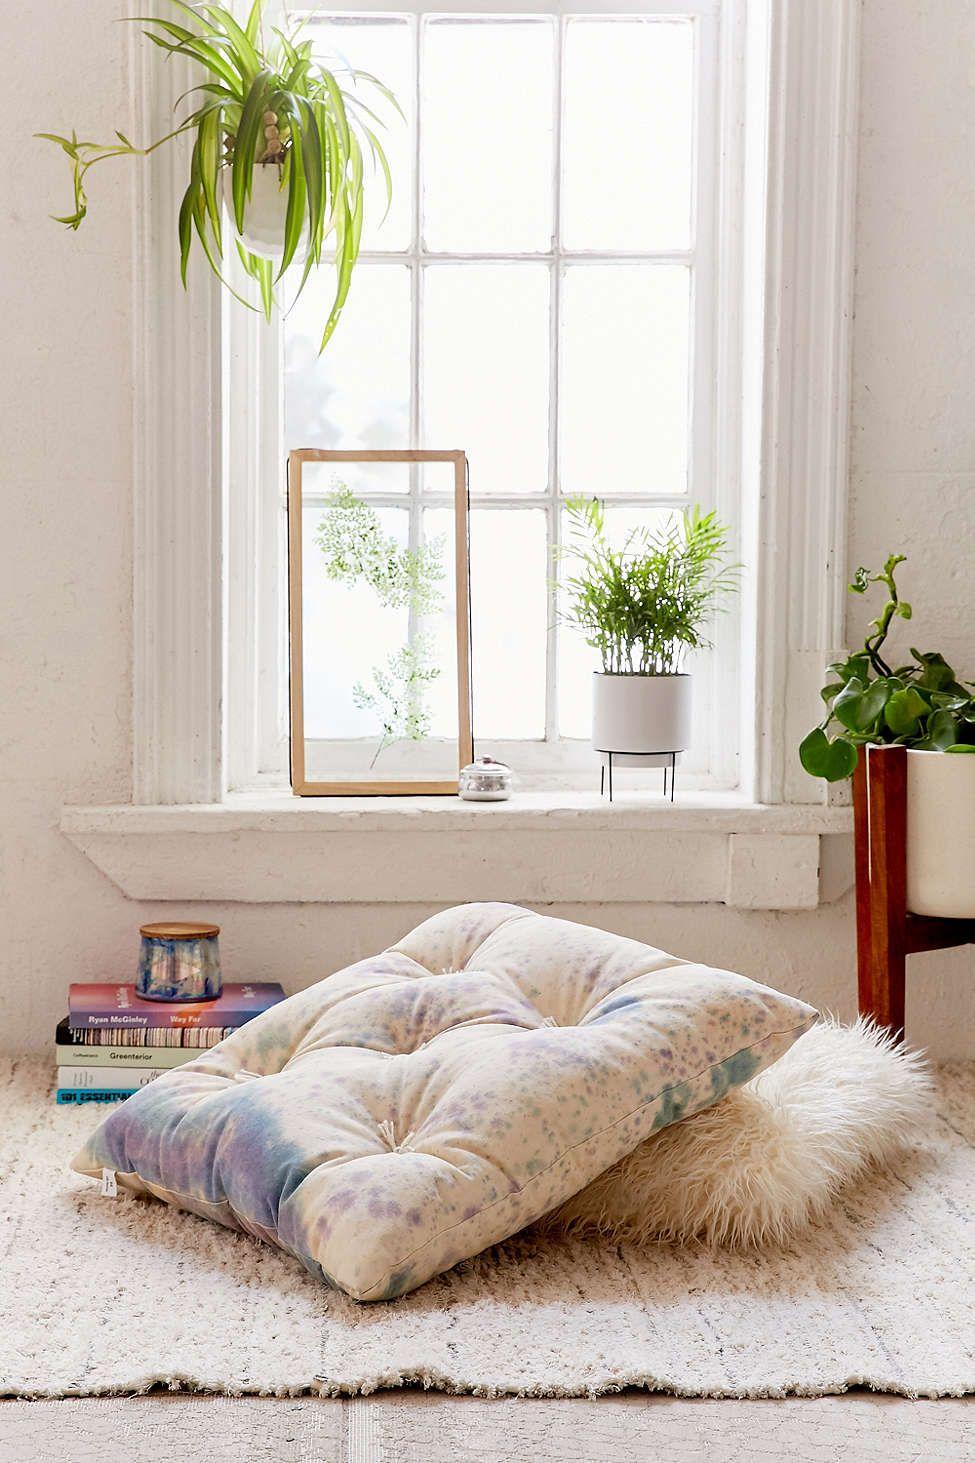 Hanna Drop Cloth Floor Pillow | Floor pillows, Pillows and Apartments